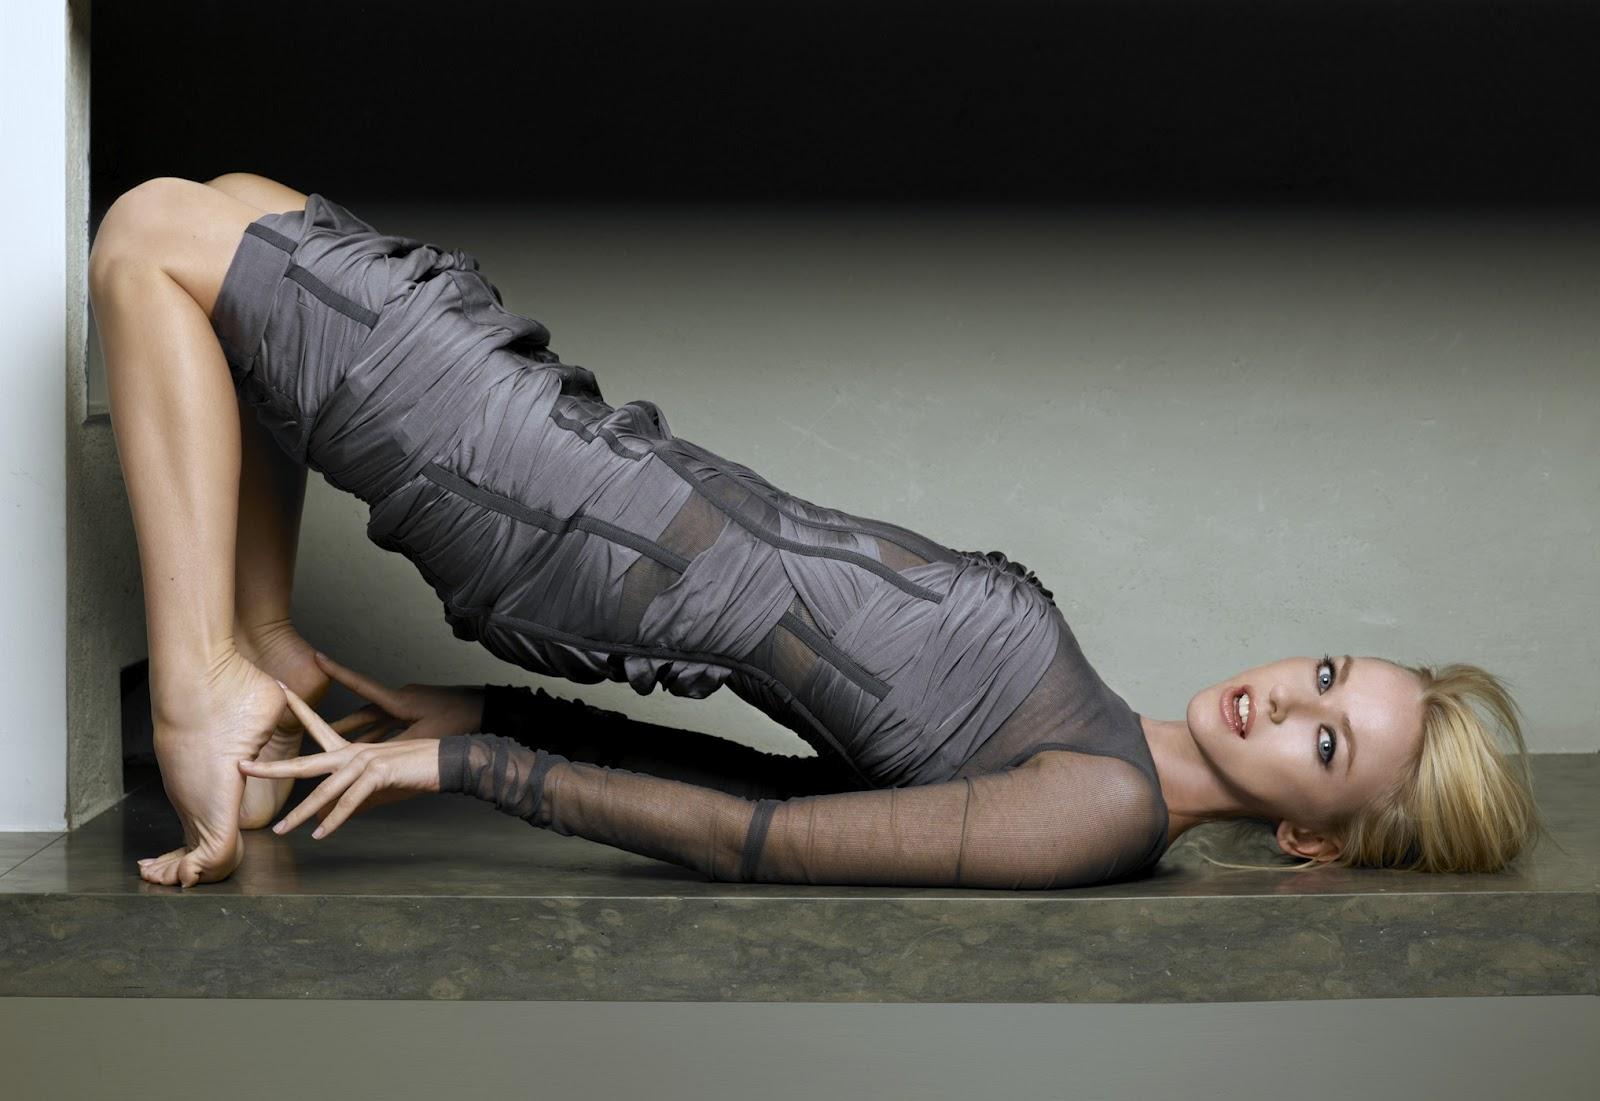 http://3.bp.blogspot.com/-bFg1KLfxRss/T_RQS-rgYCI/AAAAAAAACZ8/U7hIYPL3t18/s1600/Naomi-Watts-Feet-40326.jpg